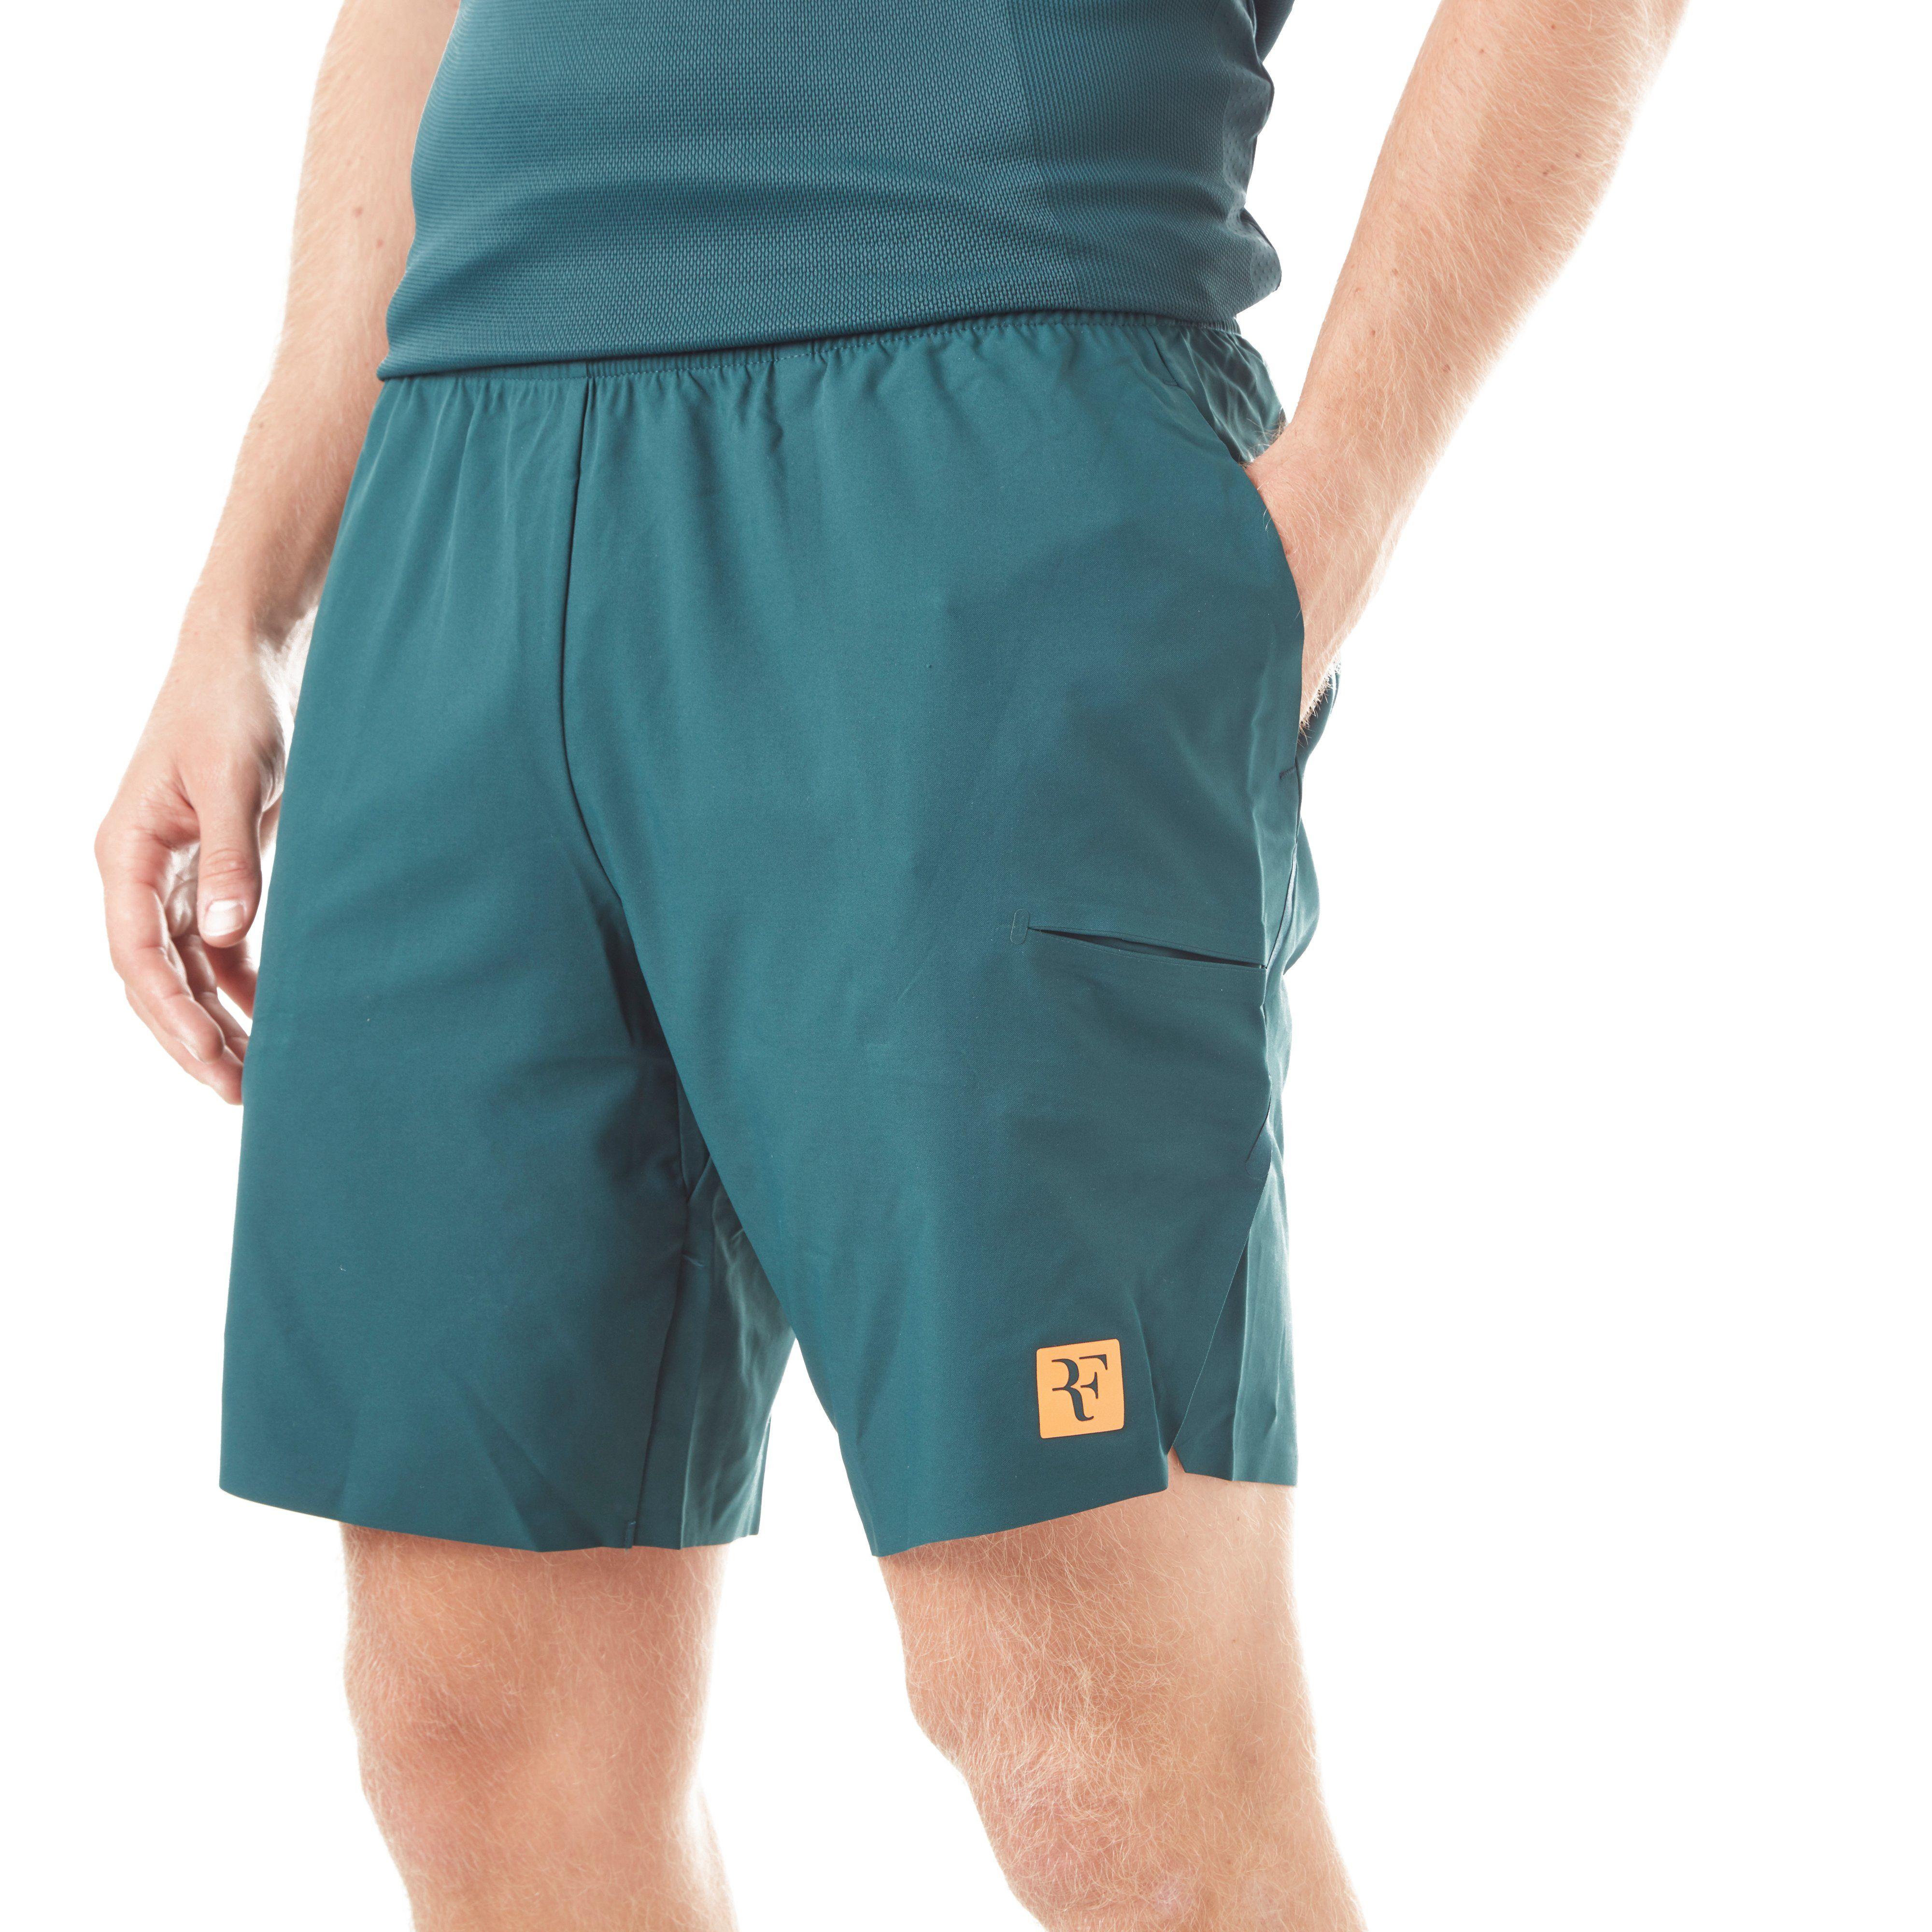 "Nike Court RF Flex Ace 9"" Men's Tennis Shorts"